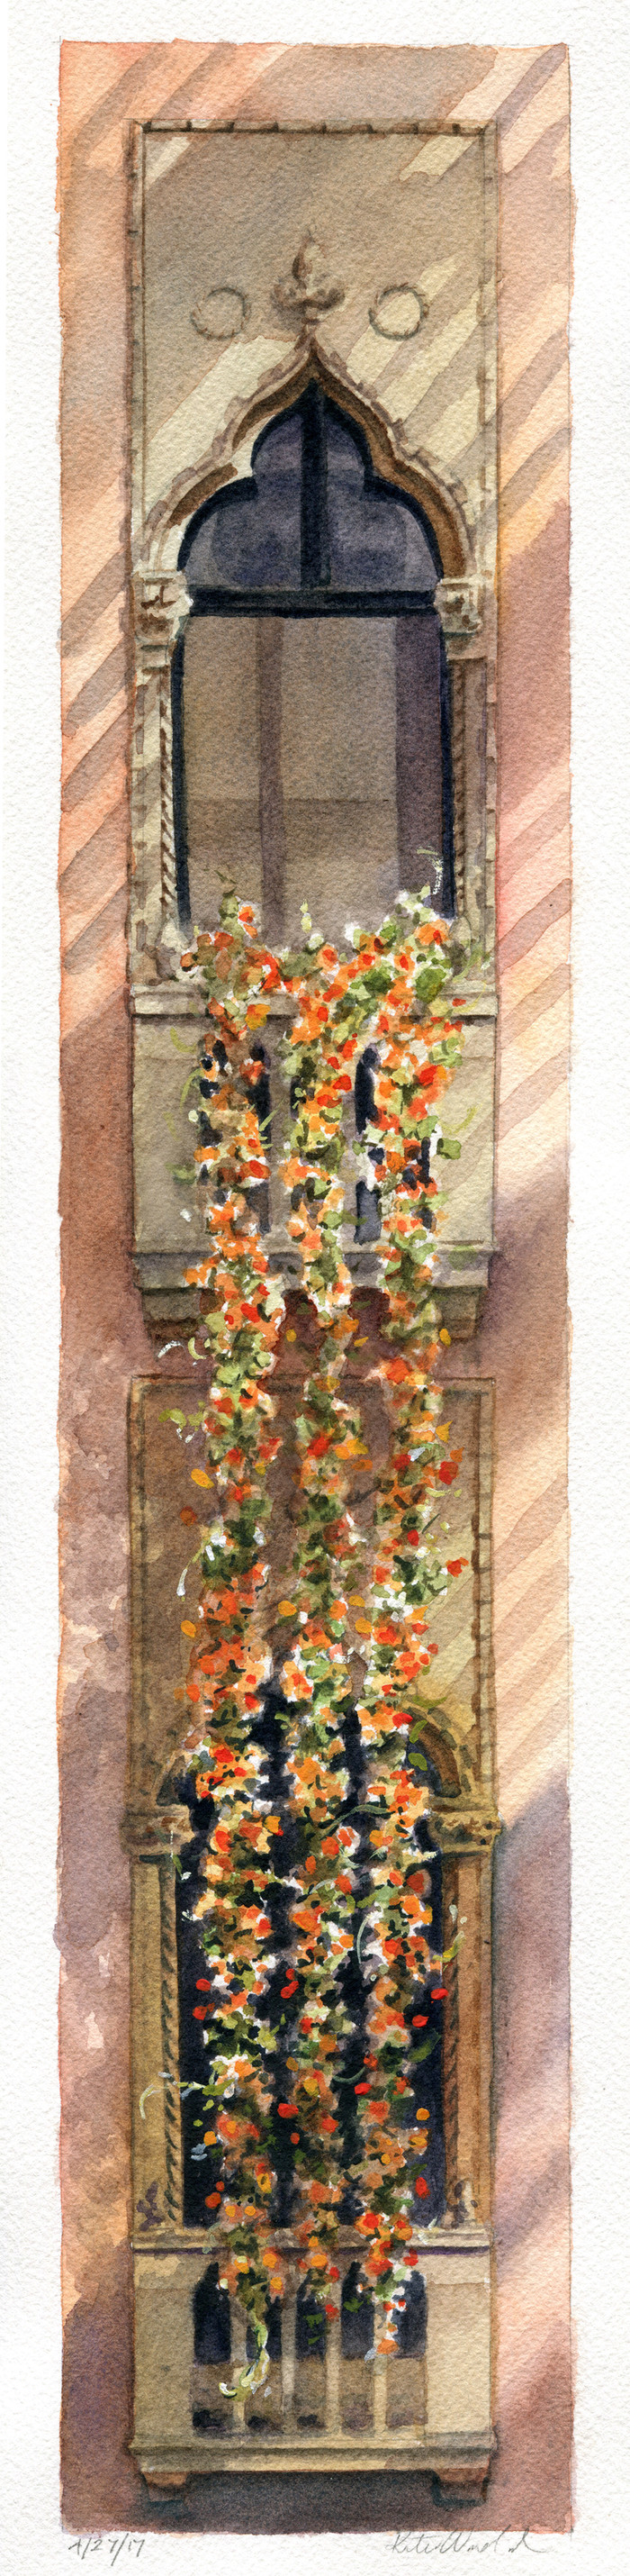 Hanging Nasturtiums